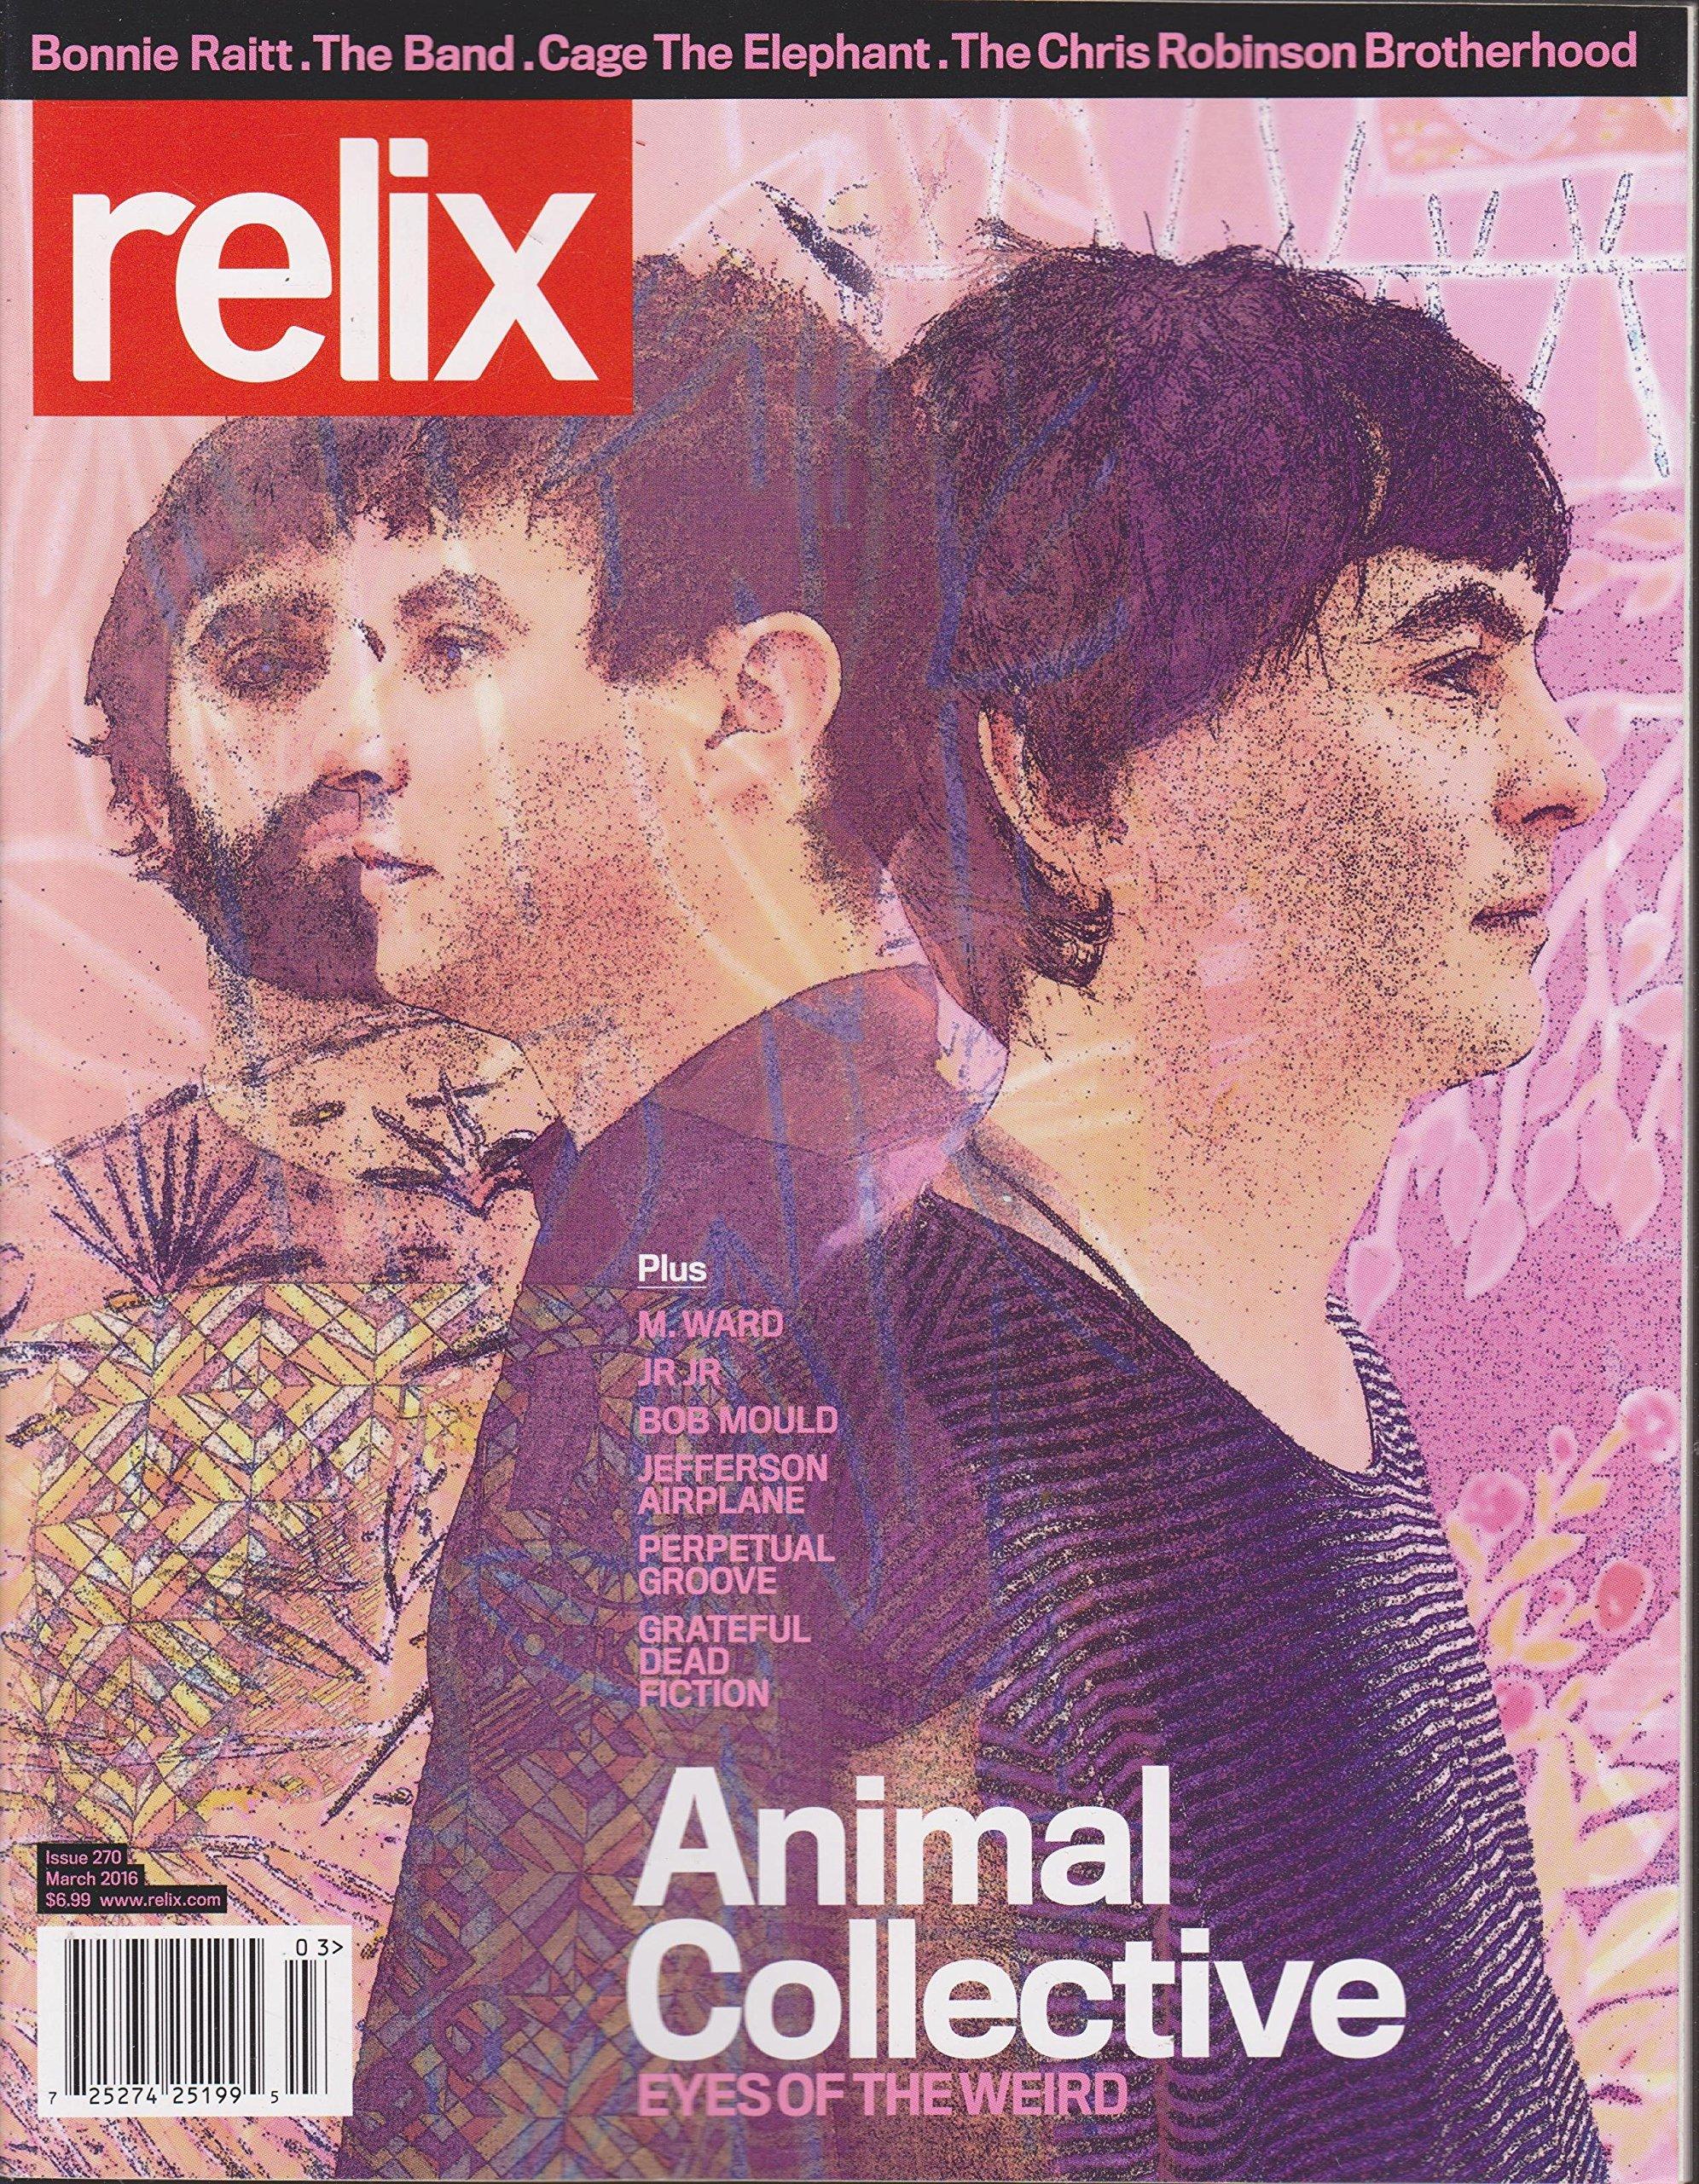 relix magazine no 270 march 2016 animal collective